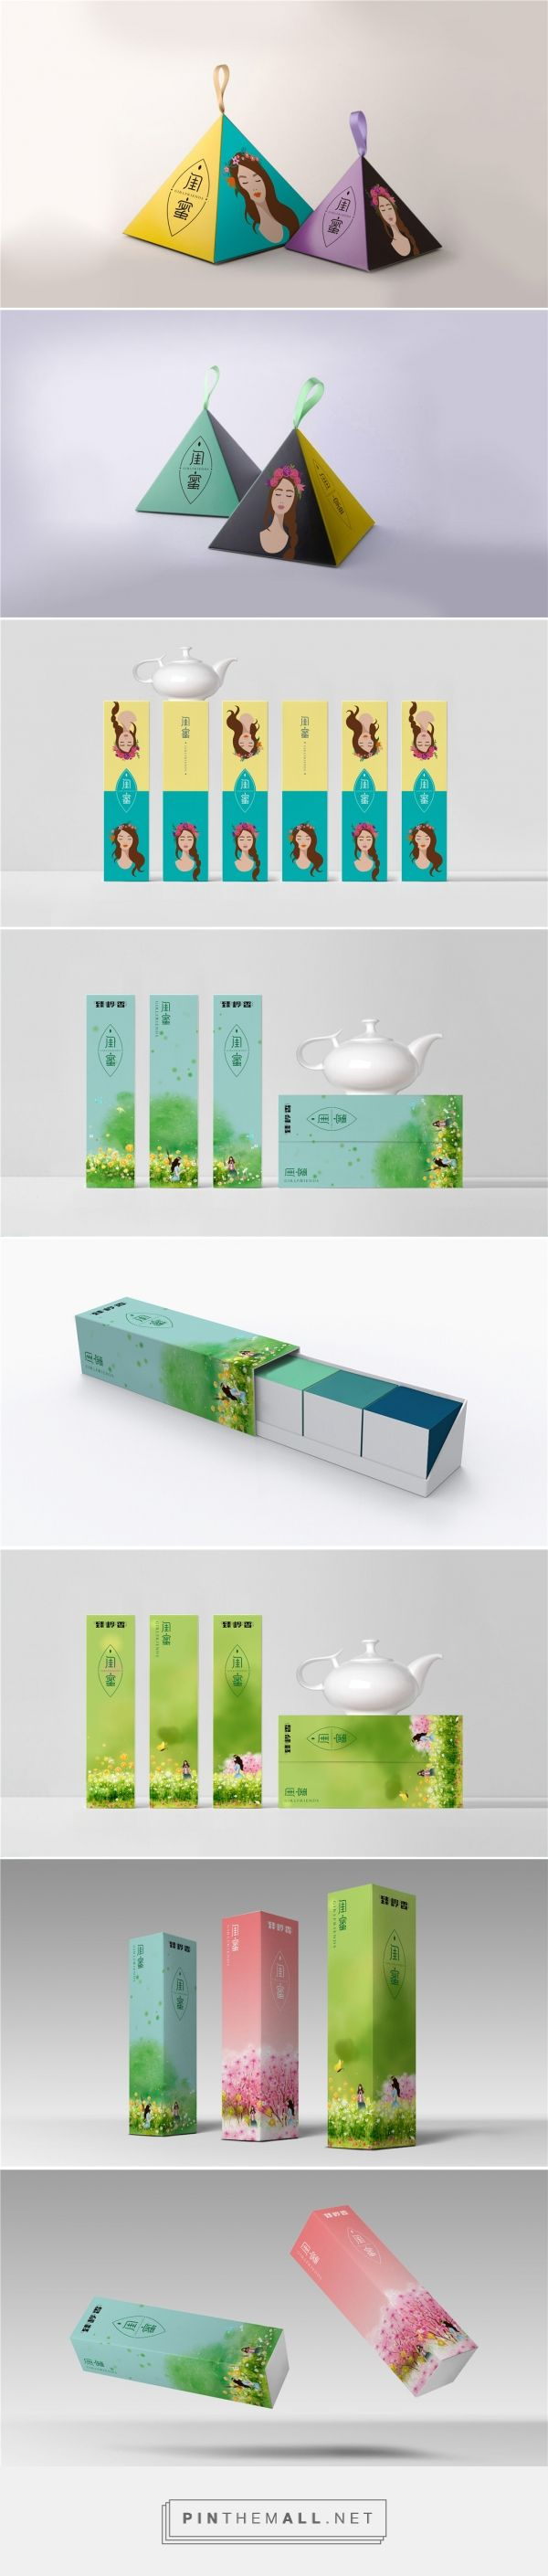 Bestie Tea - Packaging of the World - Creative Package Design Gallery - http://www.packagingoftheworld.com/2017/09/bestie-tea.html